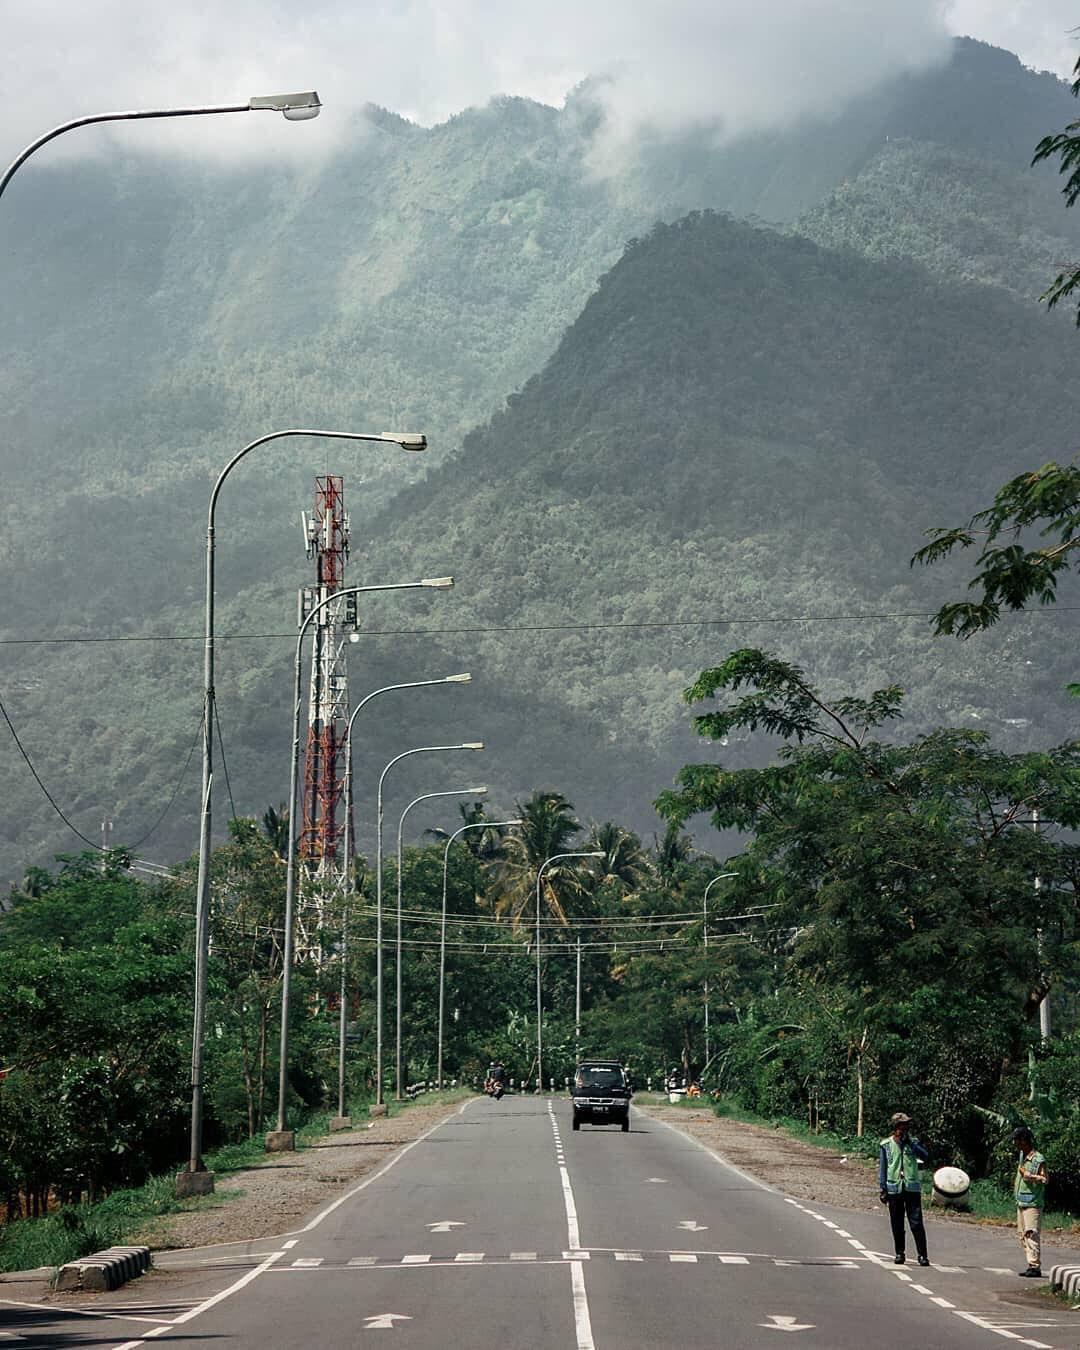 Pesona Sekitar Jla Jalan Lingkar Ambarawa Jla Memang Dibuat Untuk Mereda Kemacetan Menuju Pasar Ambar Di 2020 Pemandangan Fotografi Pemandangan Fotografi Perjalanan